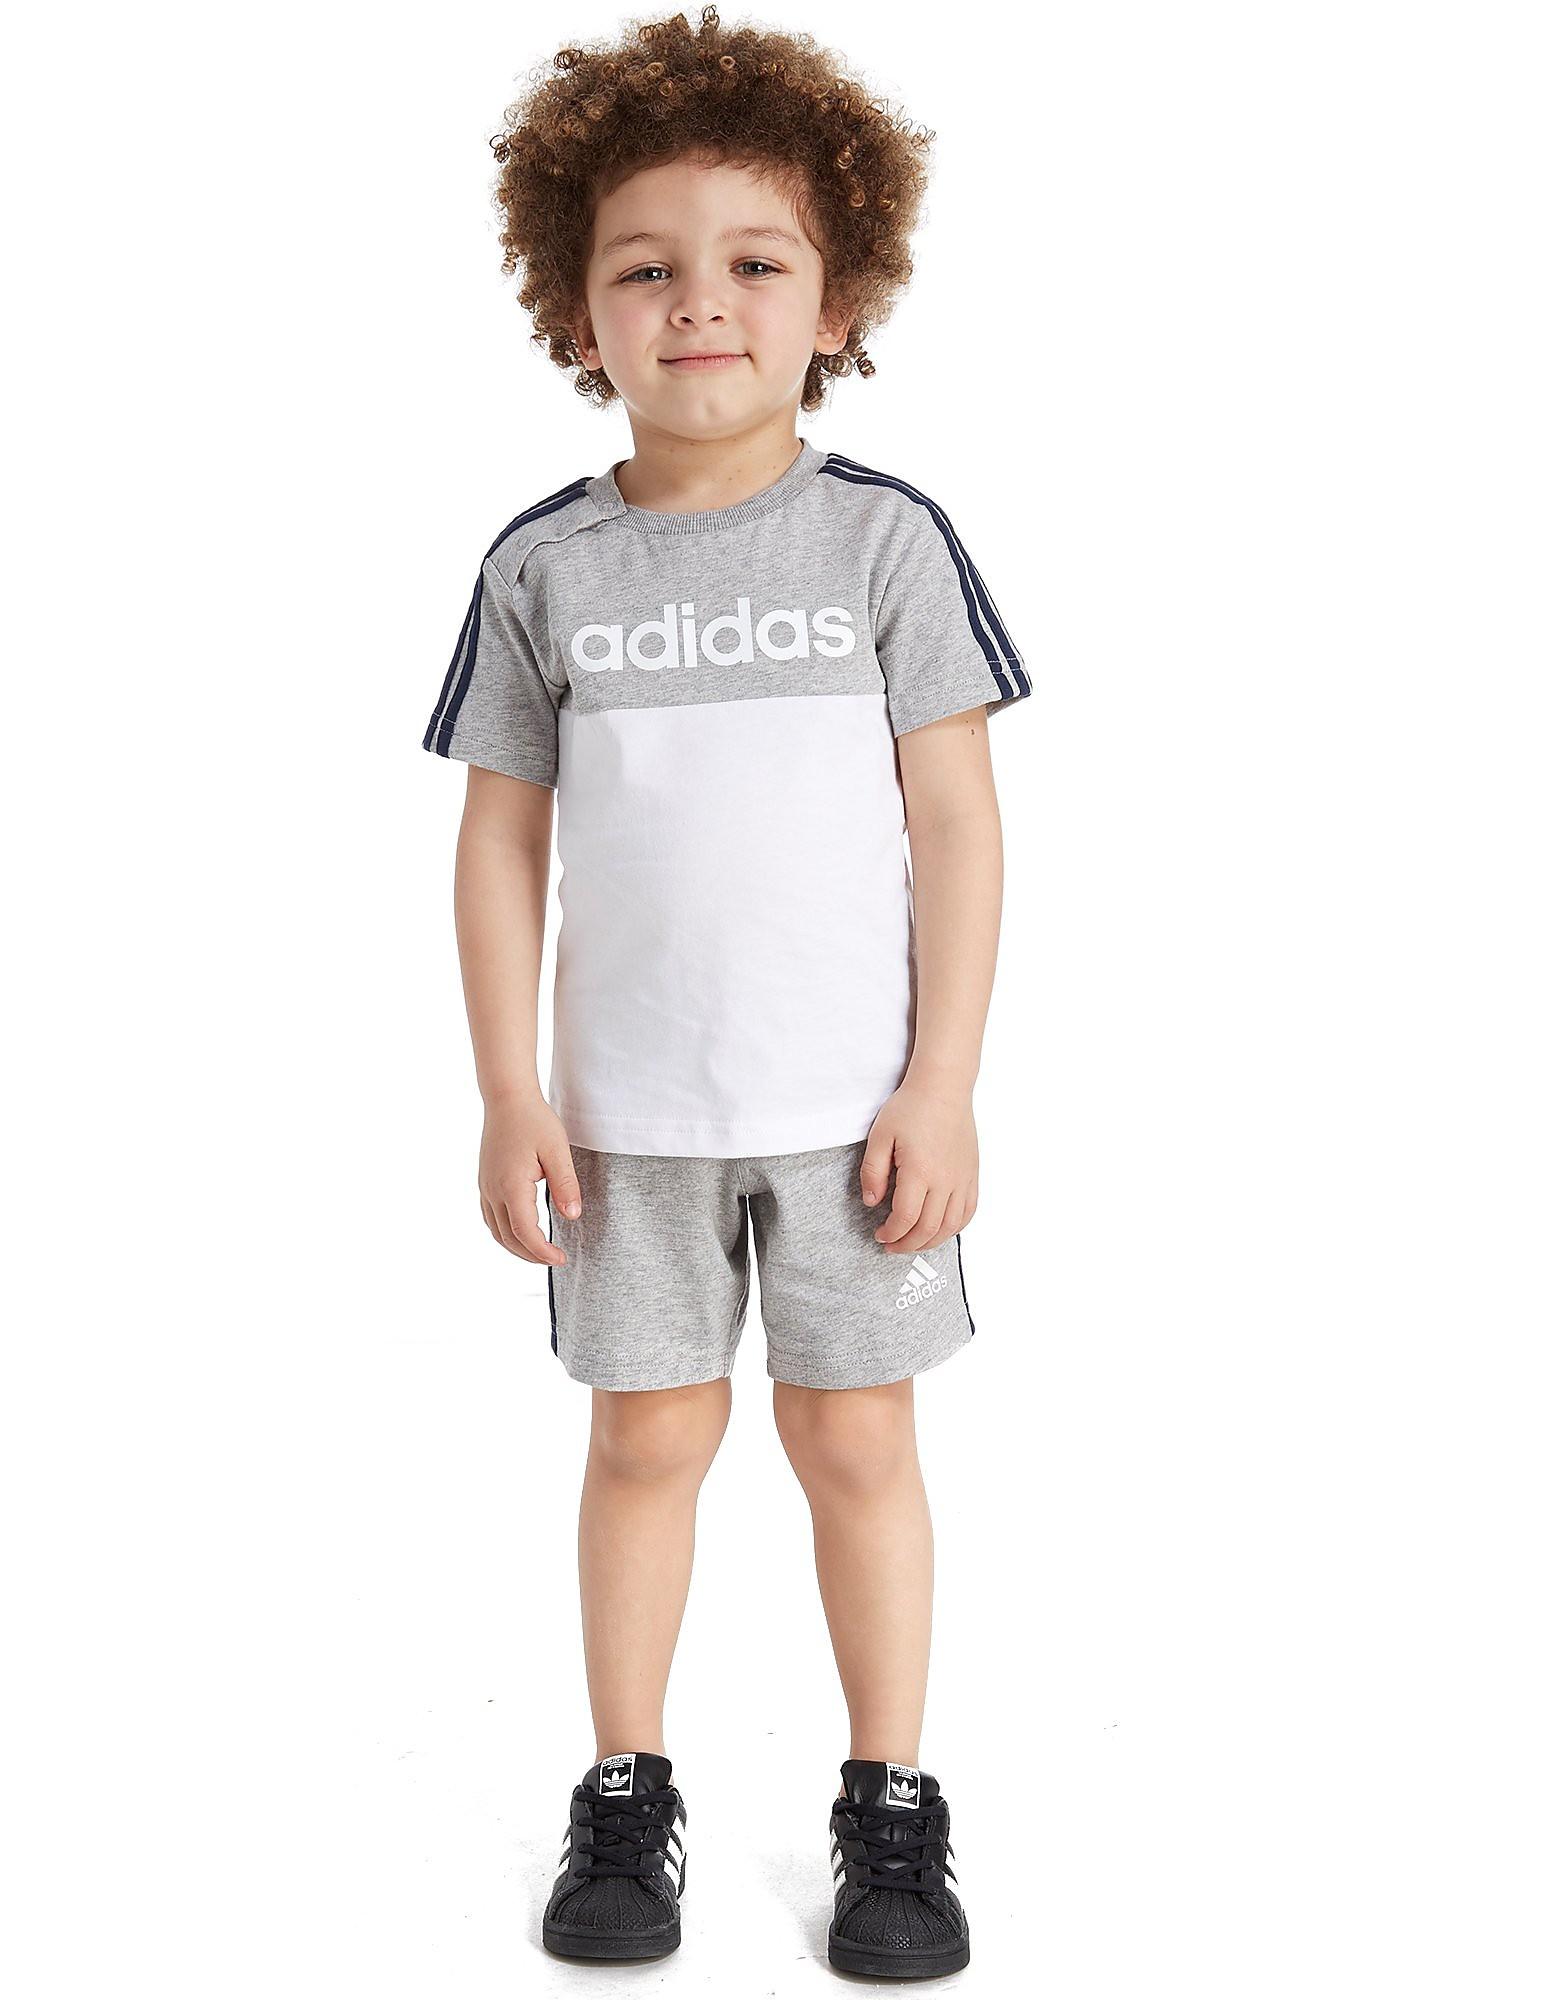 adidas Linear T-Shirt/Short Set Infant